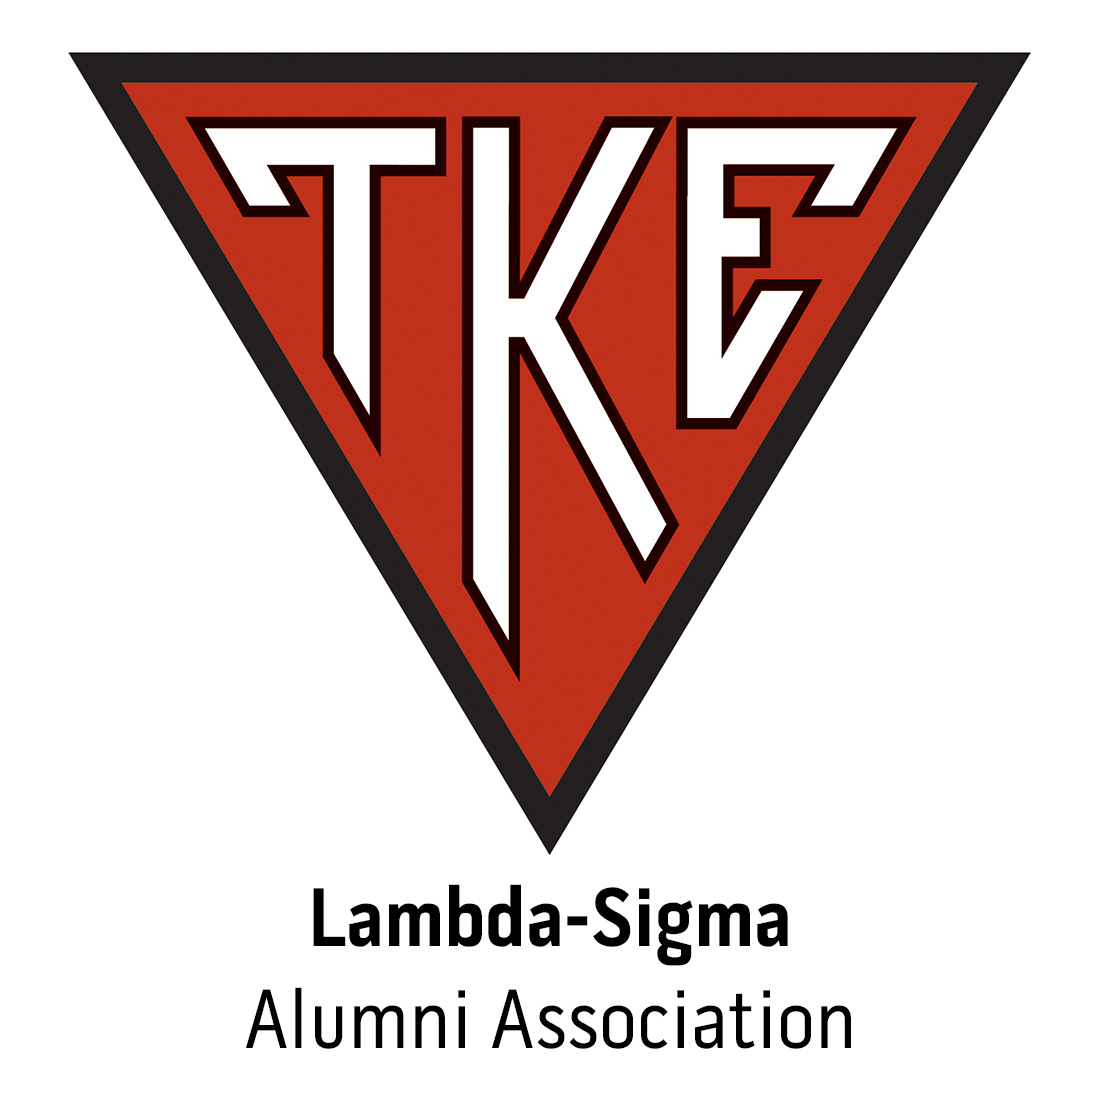 Lambda-Sigma Alumni Association for Keene State College